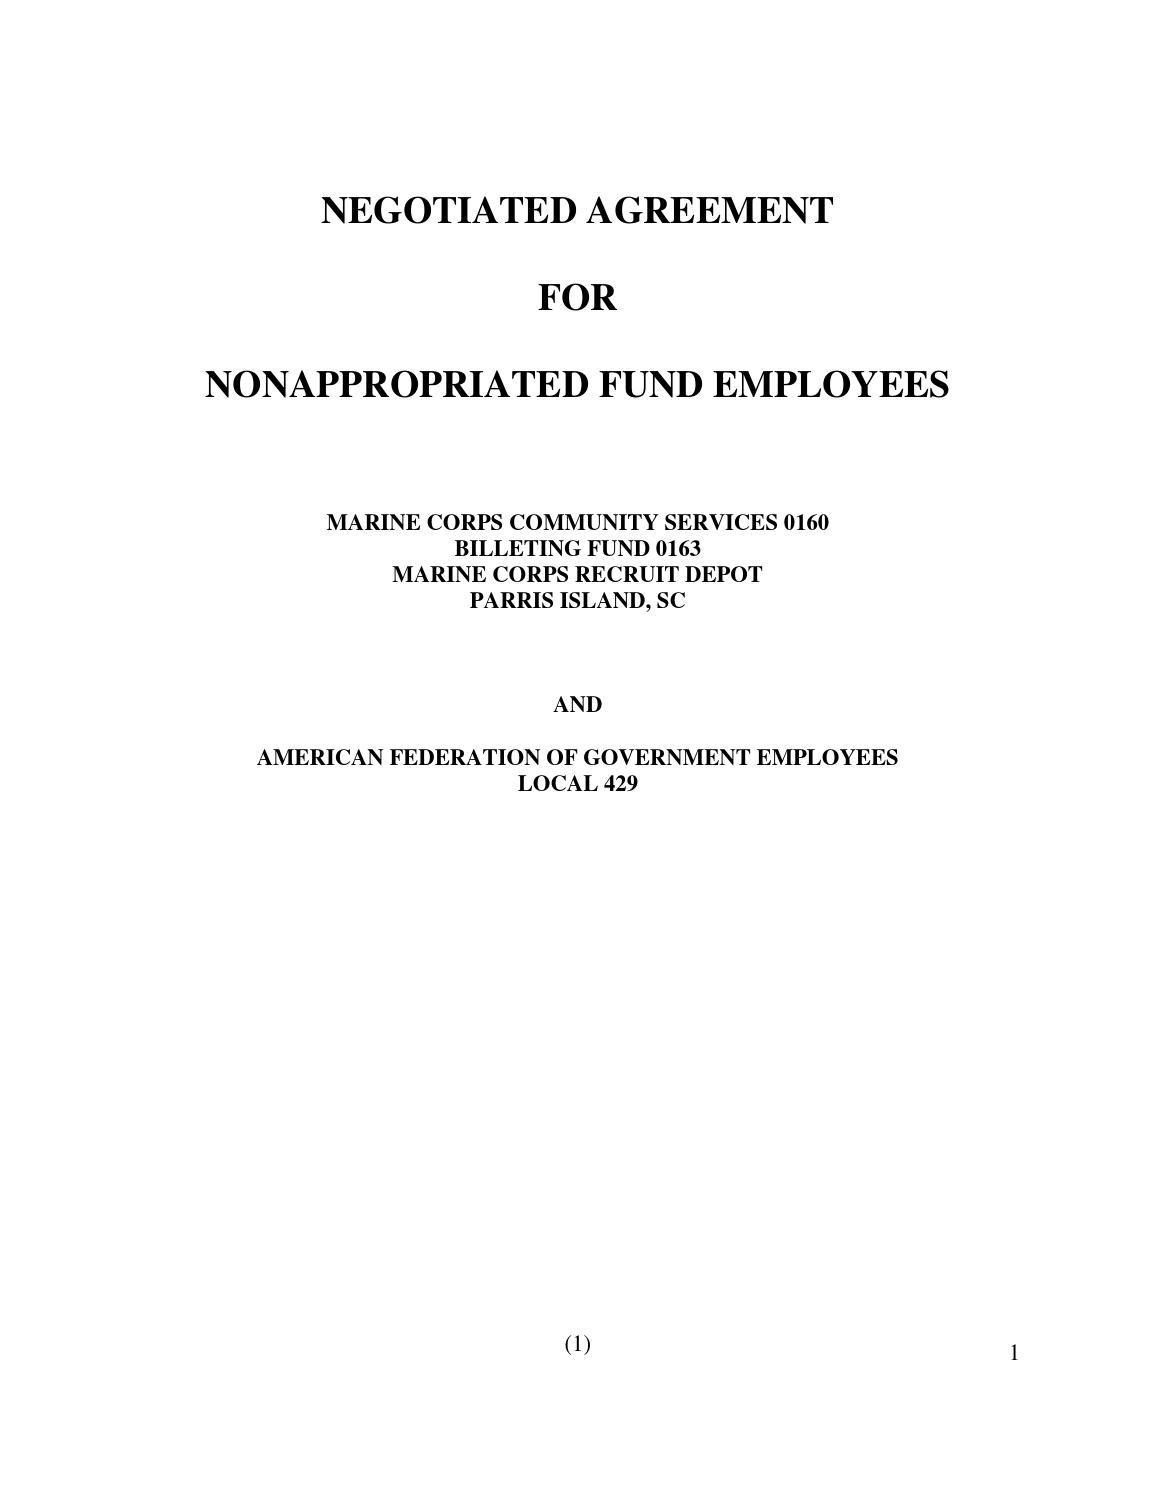 Mccs South Carolina Naf Union Contract By Mccs Issuu